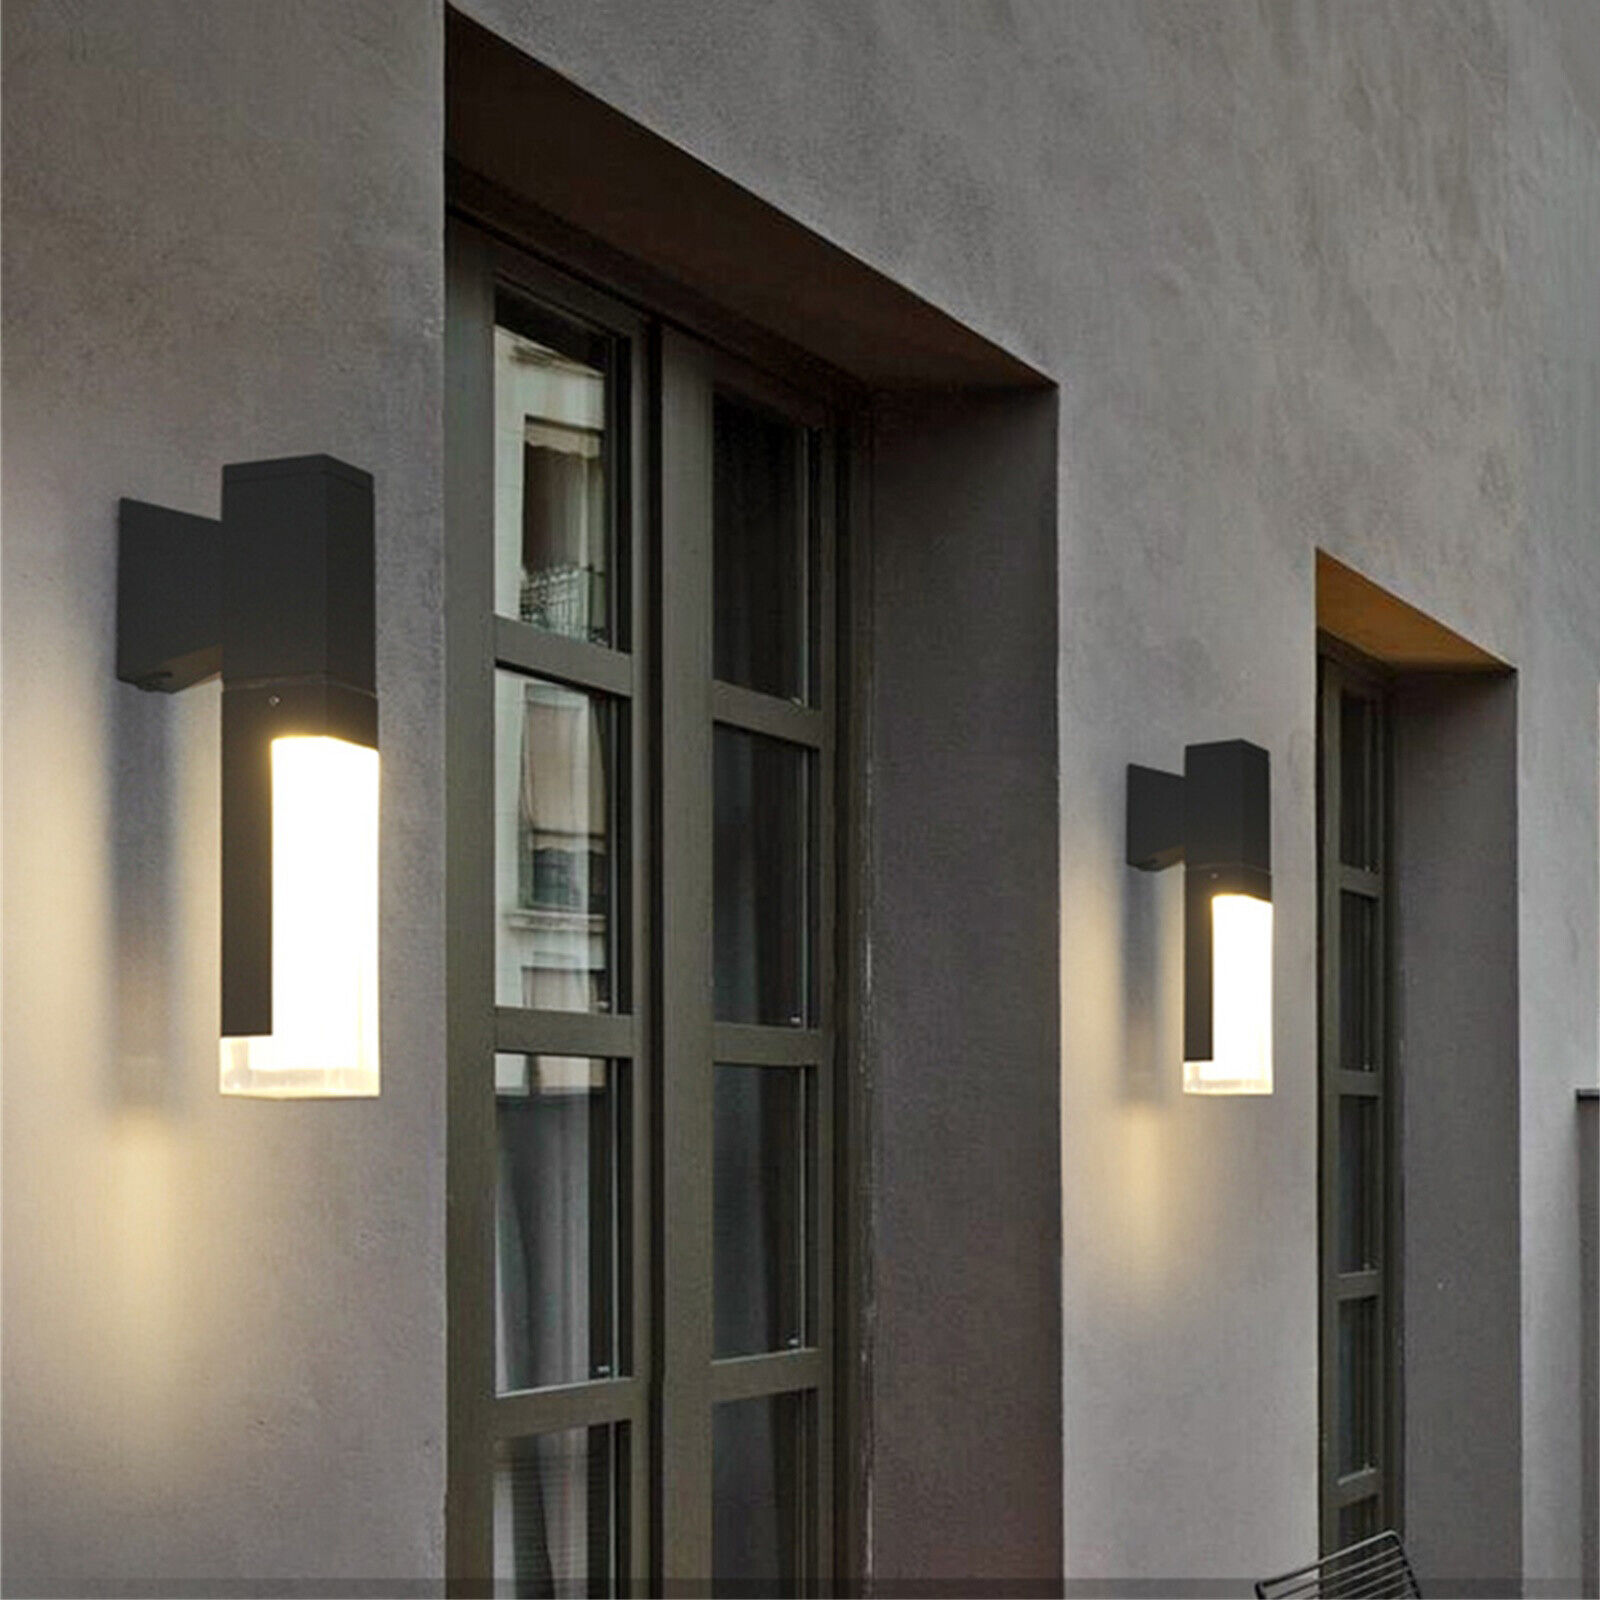 Waterproof Outdoor Wall Light Lamp Motion Sensor Wall Led Light Decorative St Ebay